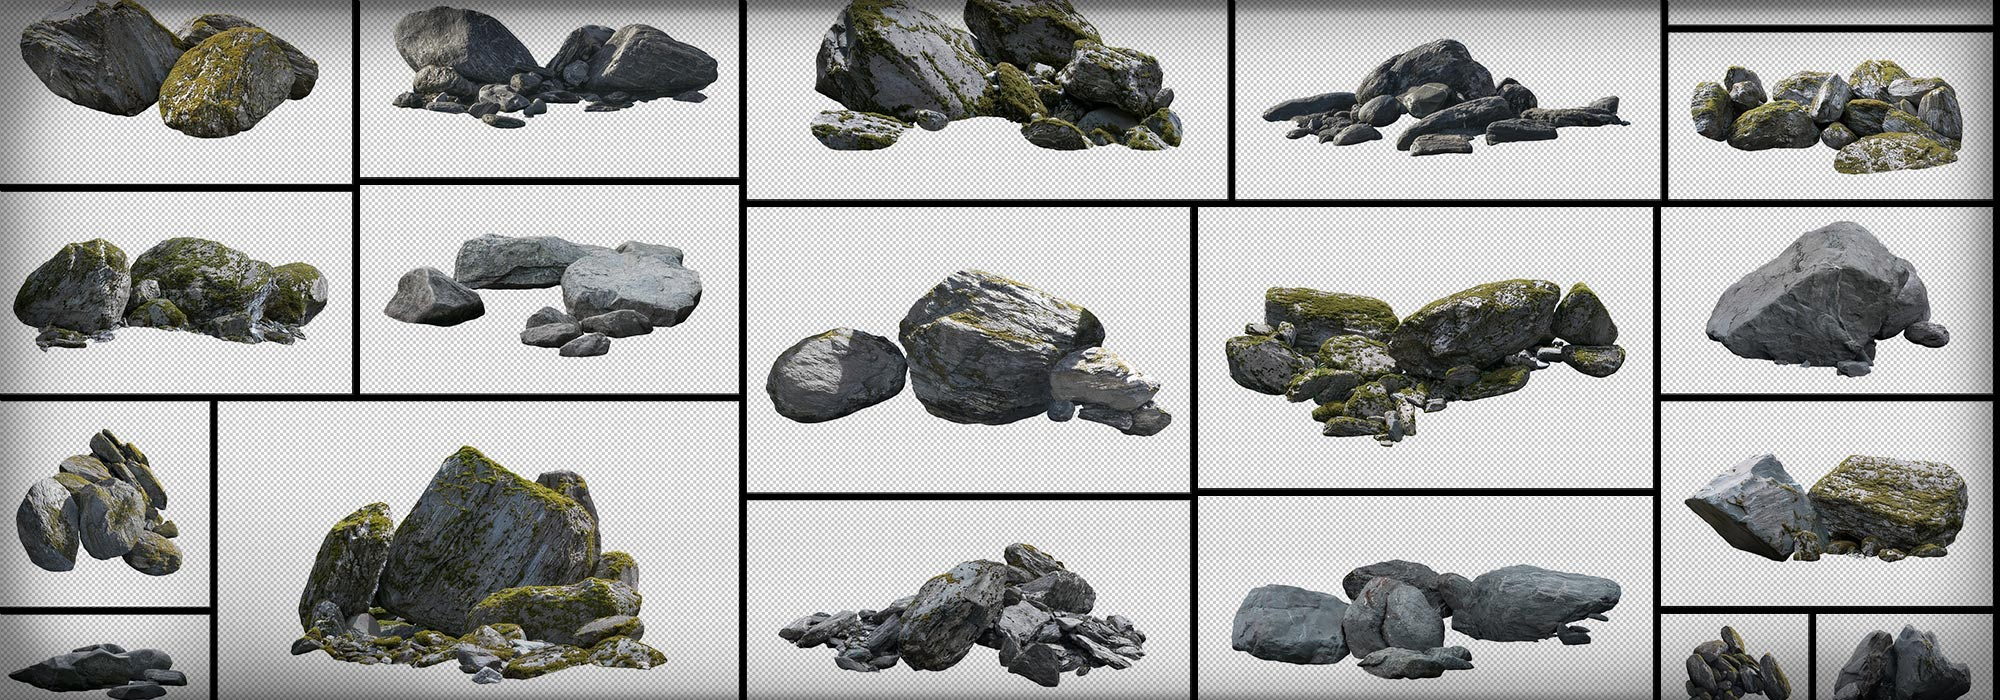 Masked Rocks Mossy Stones PNG Cutout